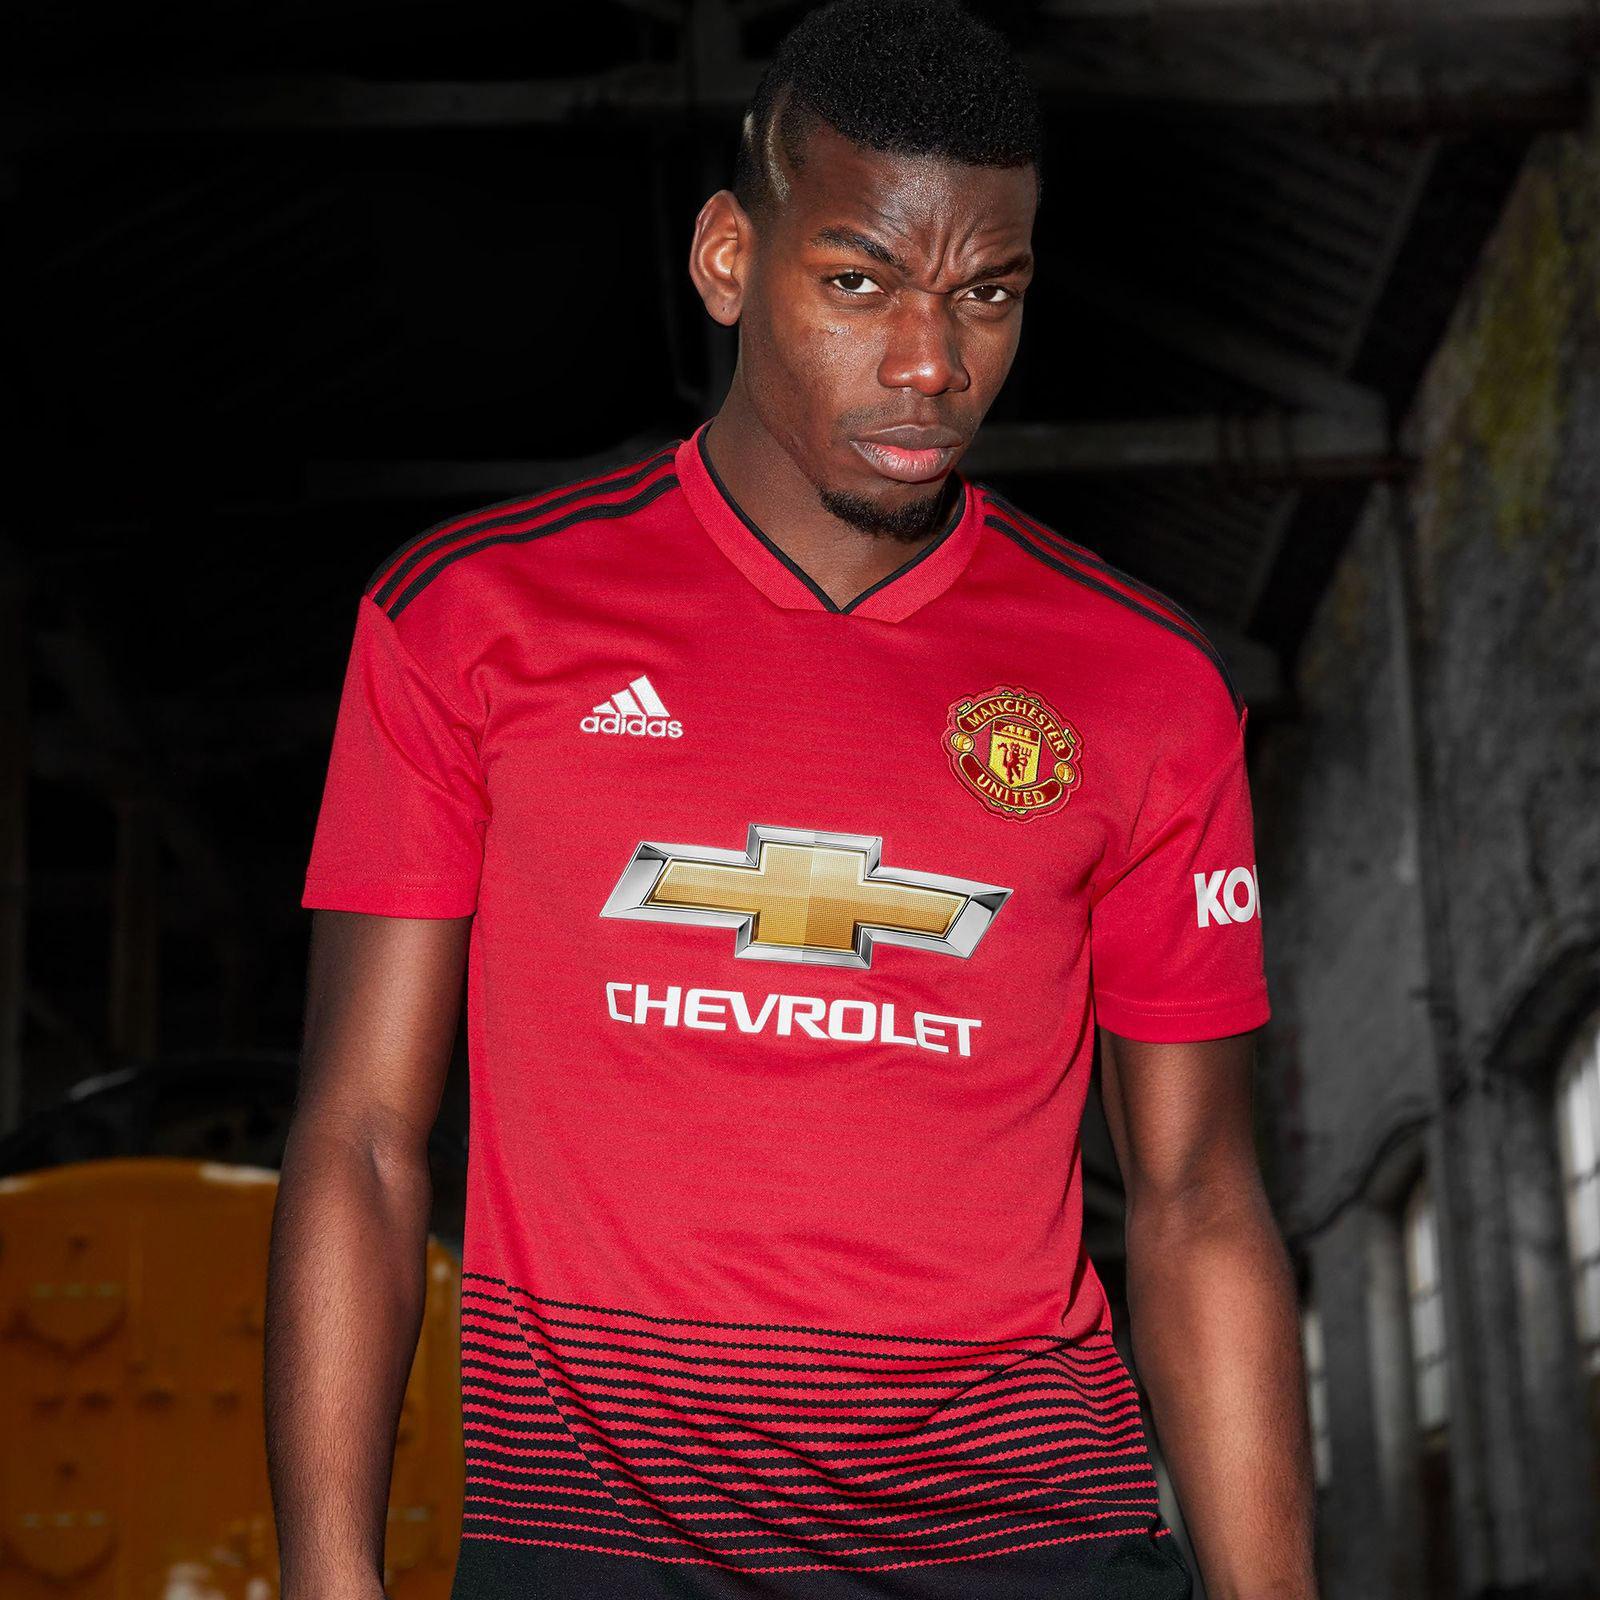 Новая домашняя форма Манчестер Юнайтед 2018 2019